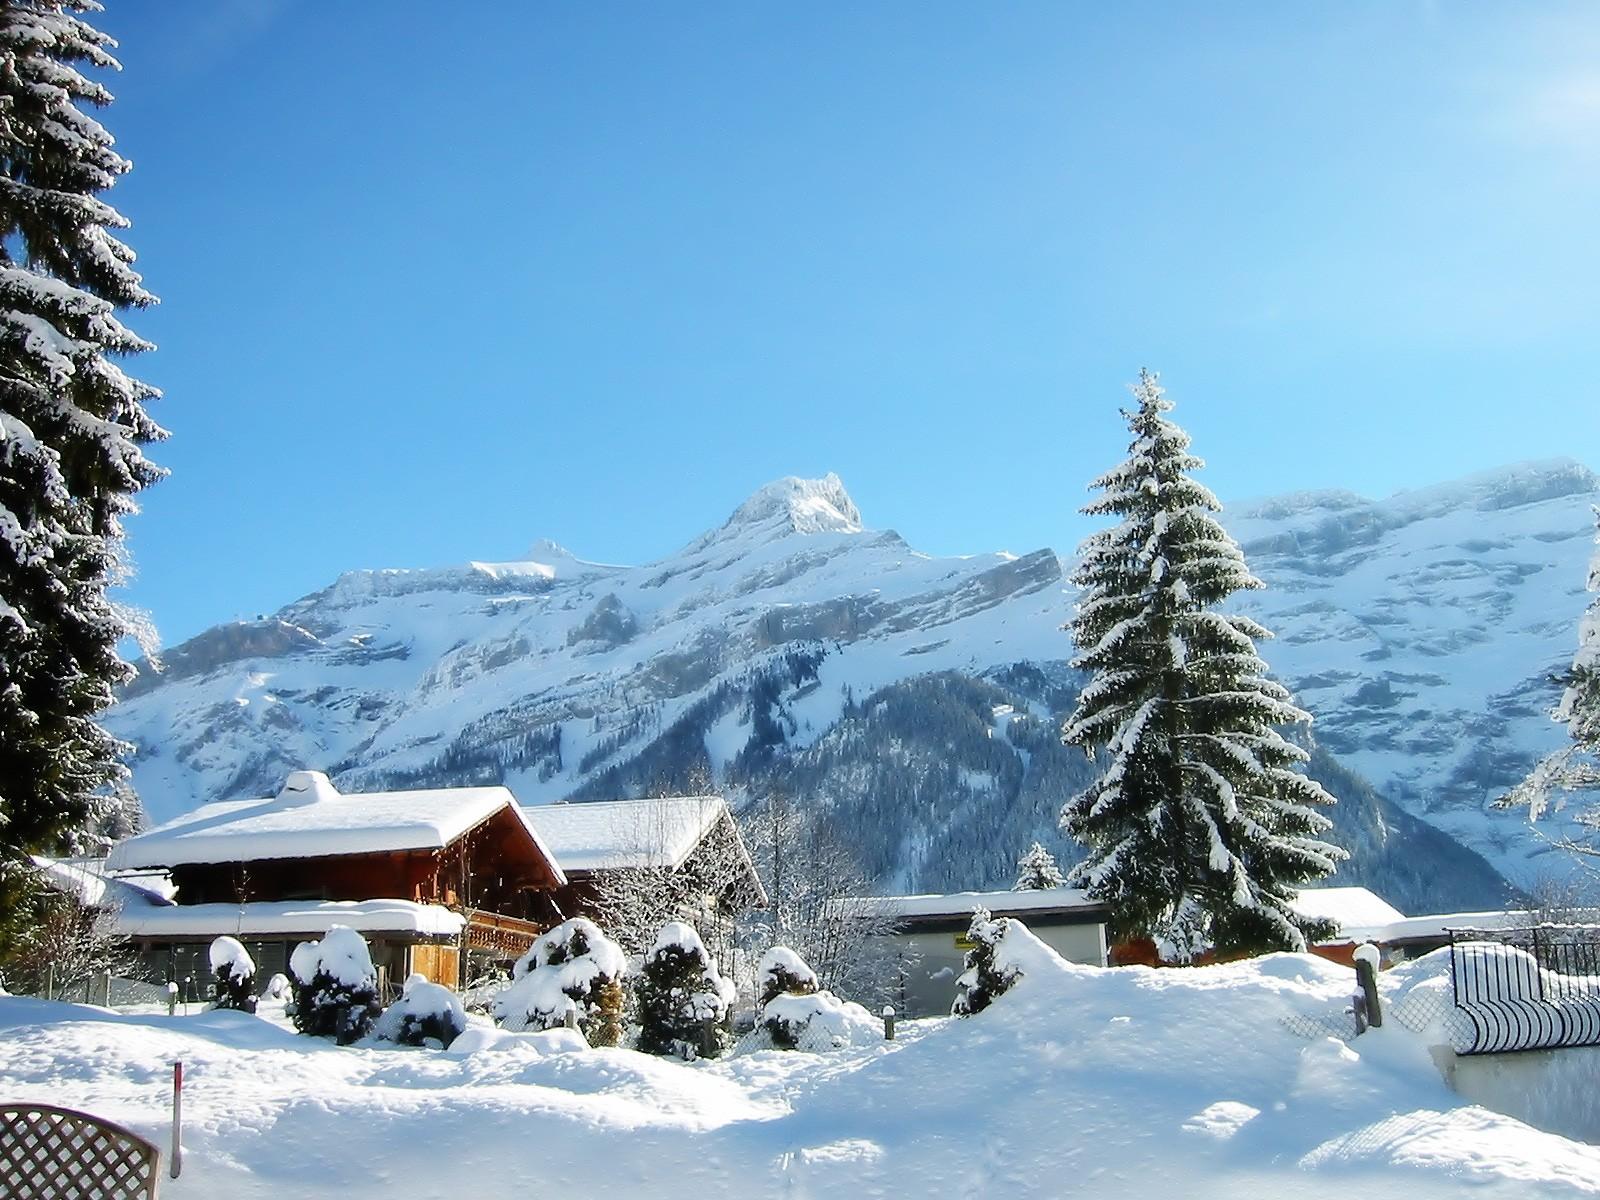 http://3.bp.blogspot.com/-gPvmugQ9gkM/TkdLBtdUySI/AAAAAAAAAFg/KY_XSoP0Low/s1600/winter_holiday_desktop_wallpaper_49578.jpg